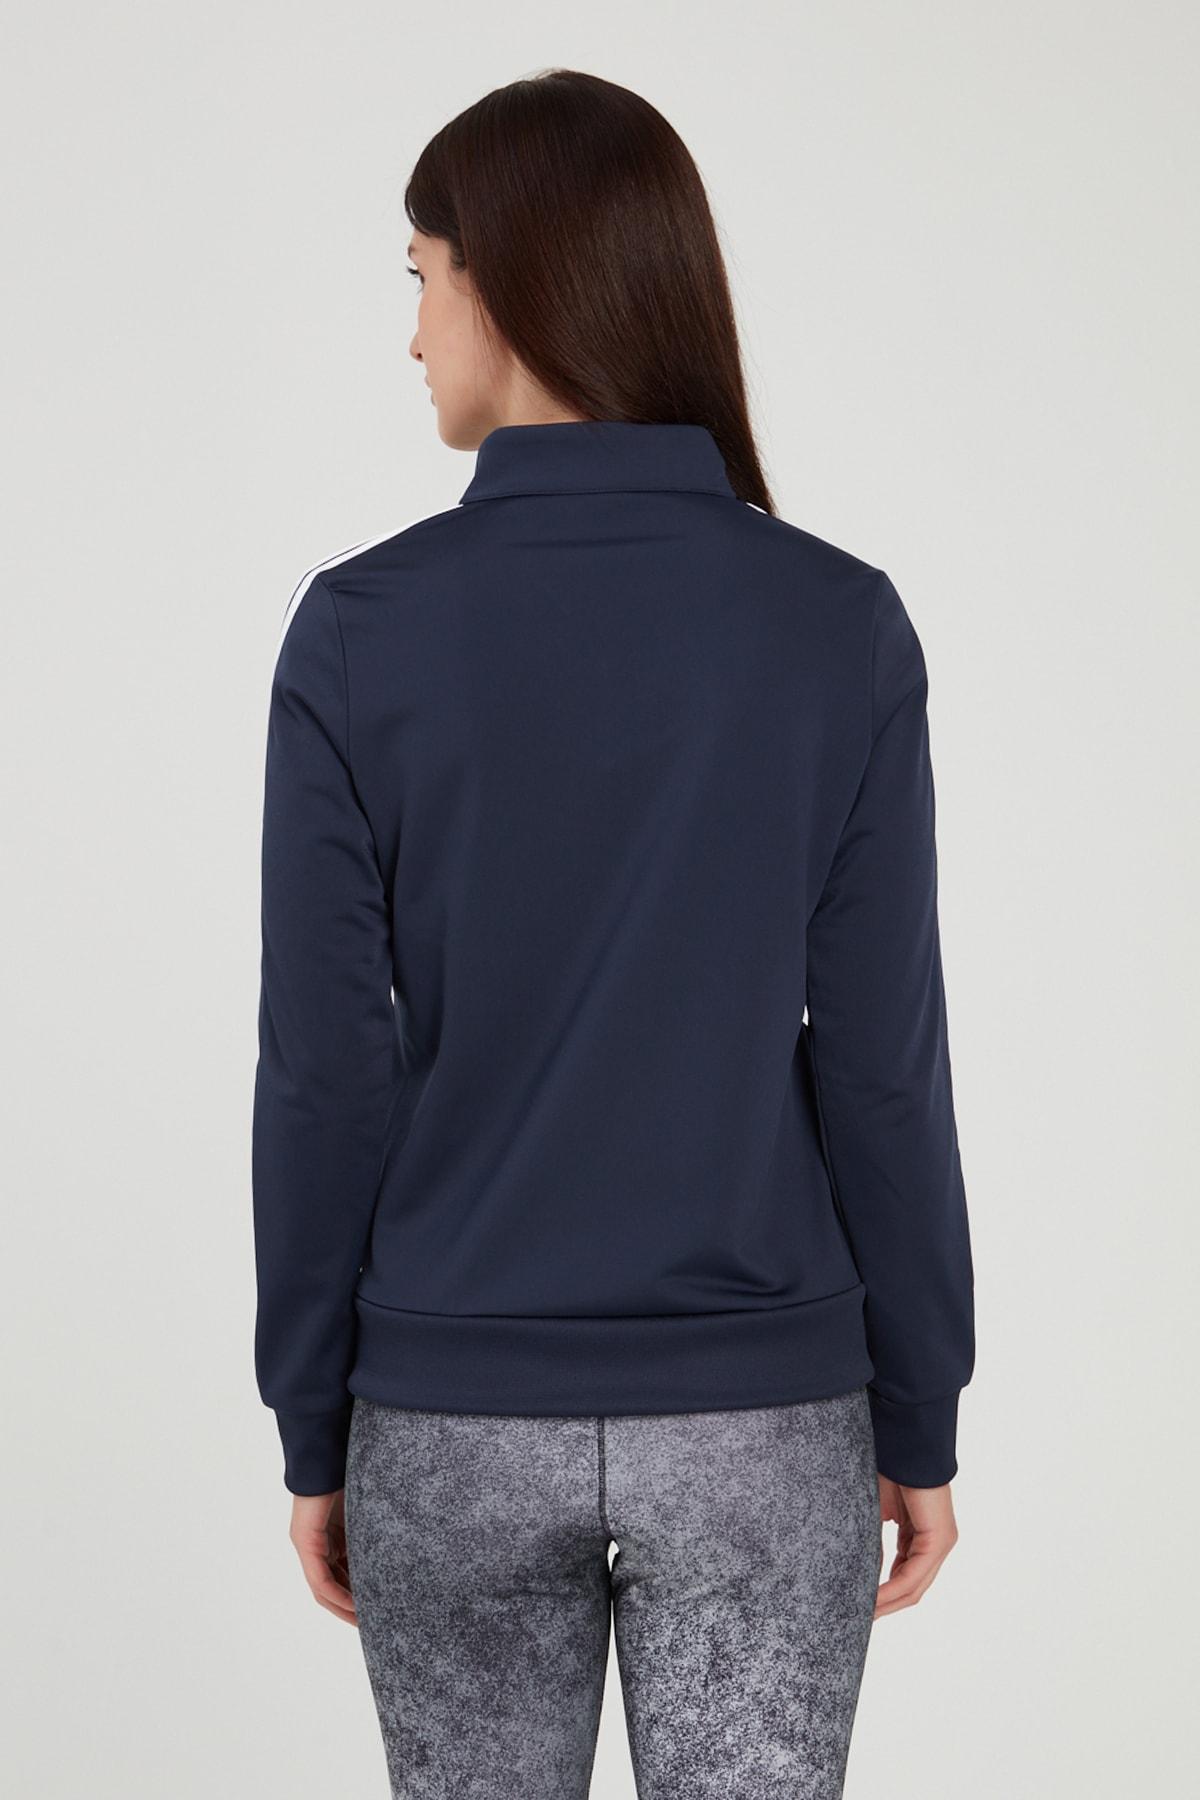 adidas Essentials Tricot Track Jacket Kadın Sweatshirt 2